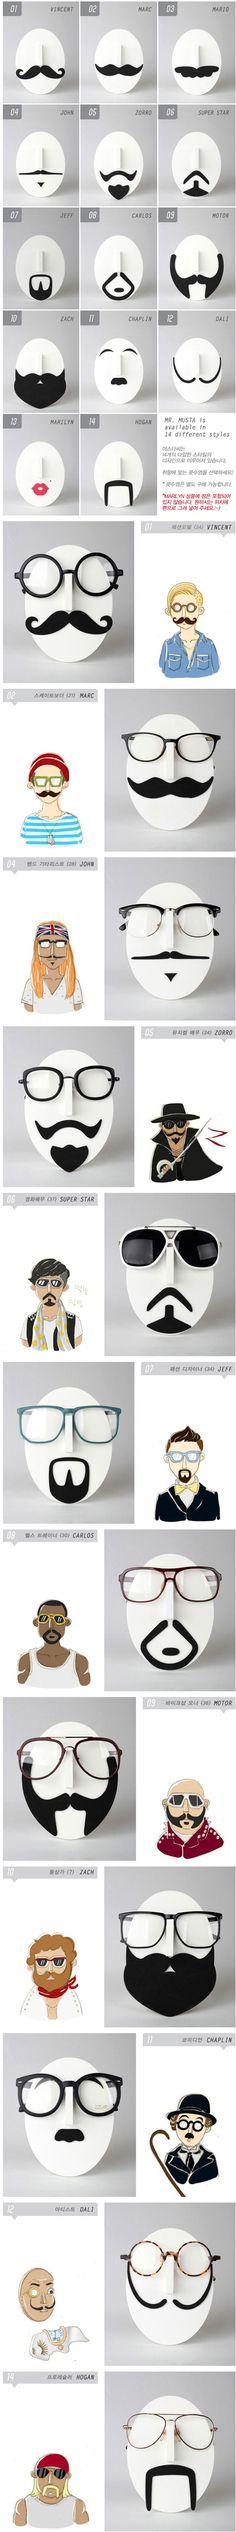 Glasses shelf - brilliant marketing/display